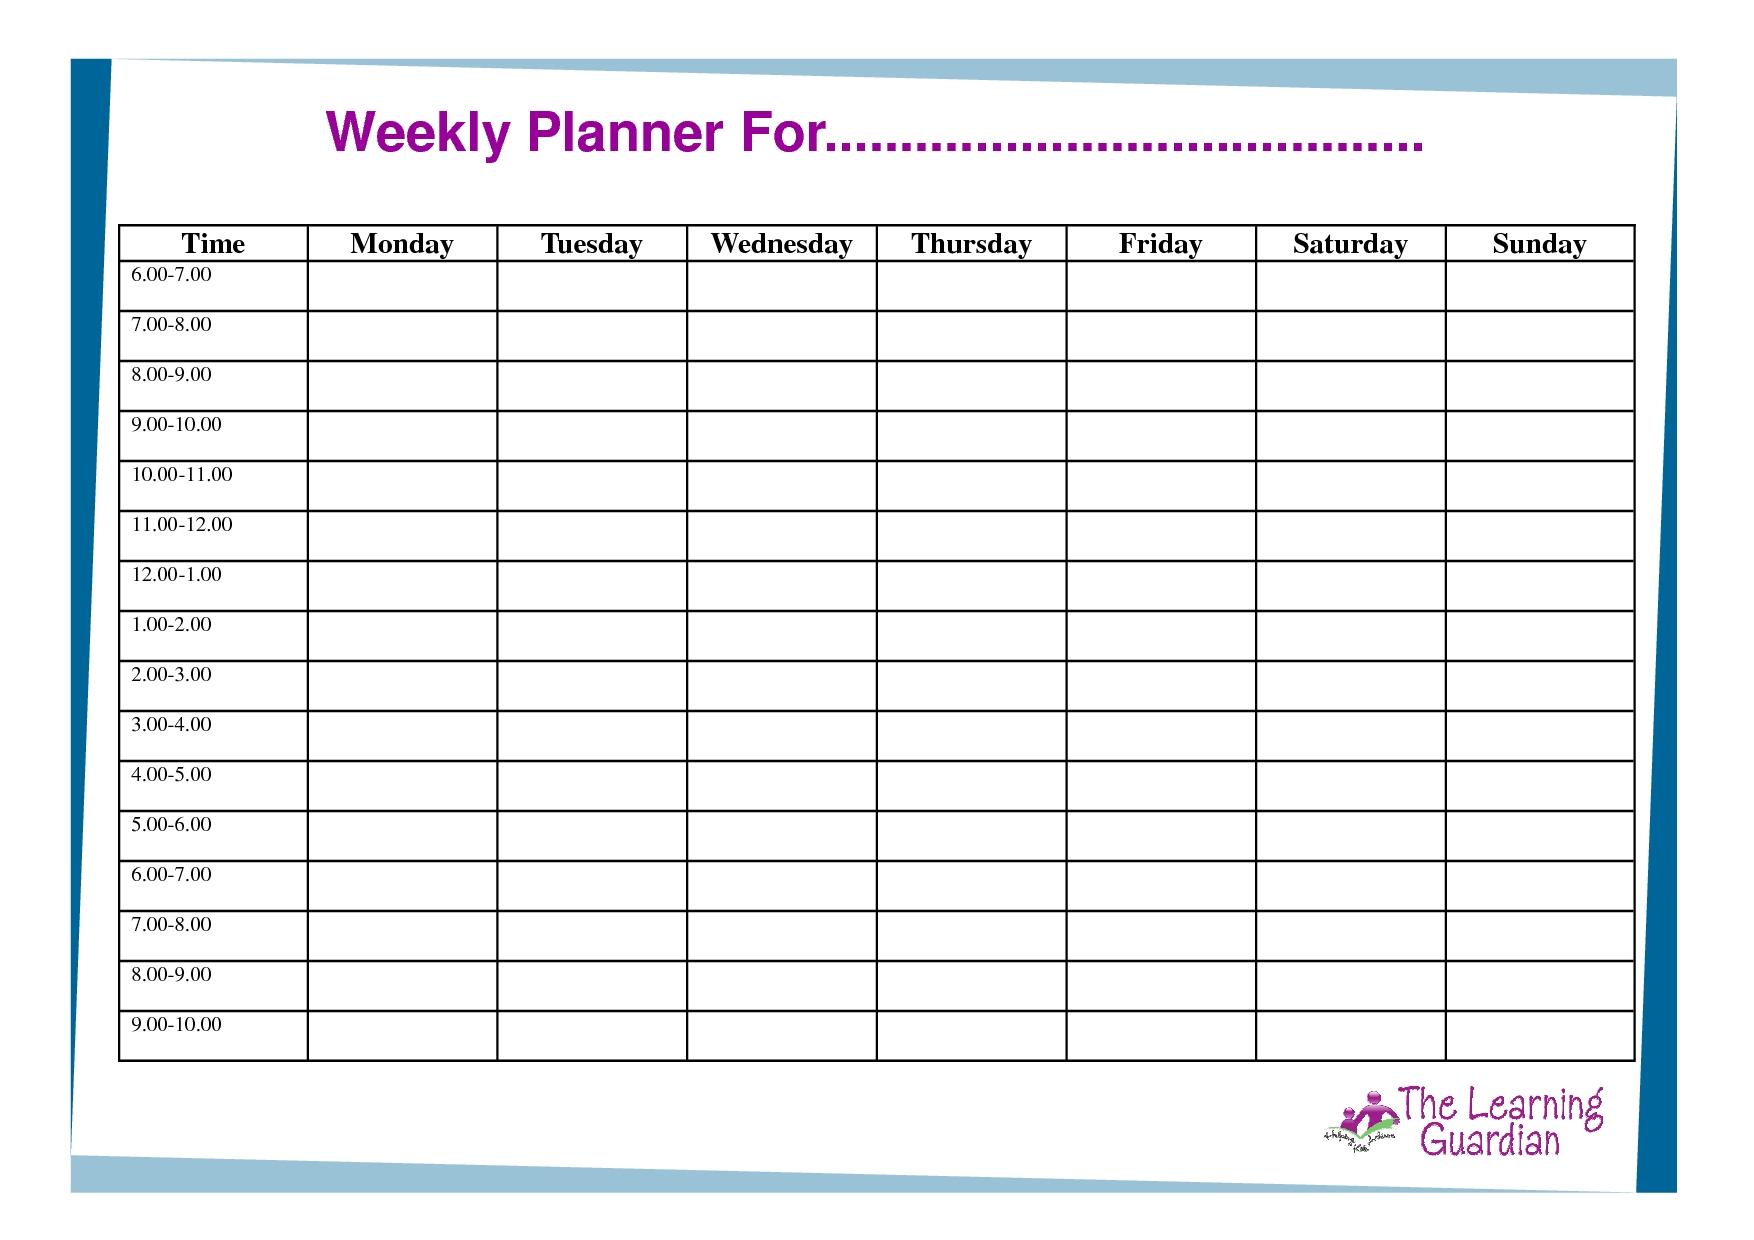 Schedule Template Monday Through Iday Weekly Calendar Ee Printable regarding Printable Monthly Calendar Template Monday Through Friday